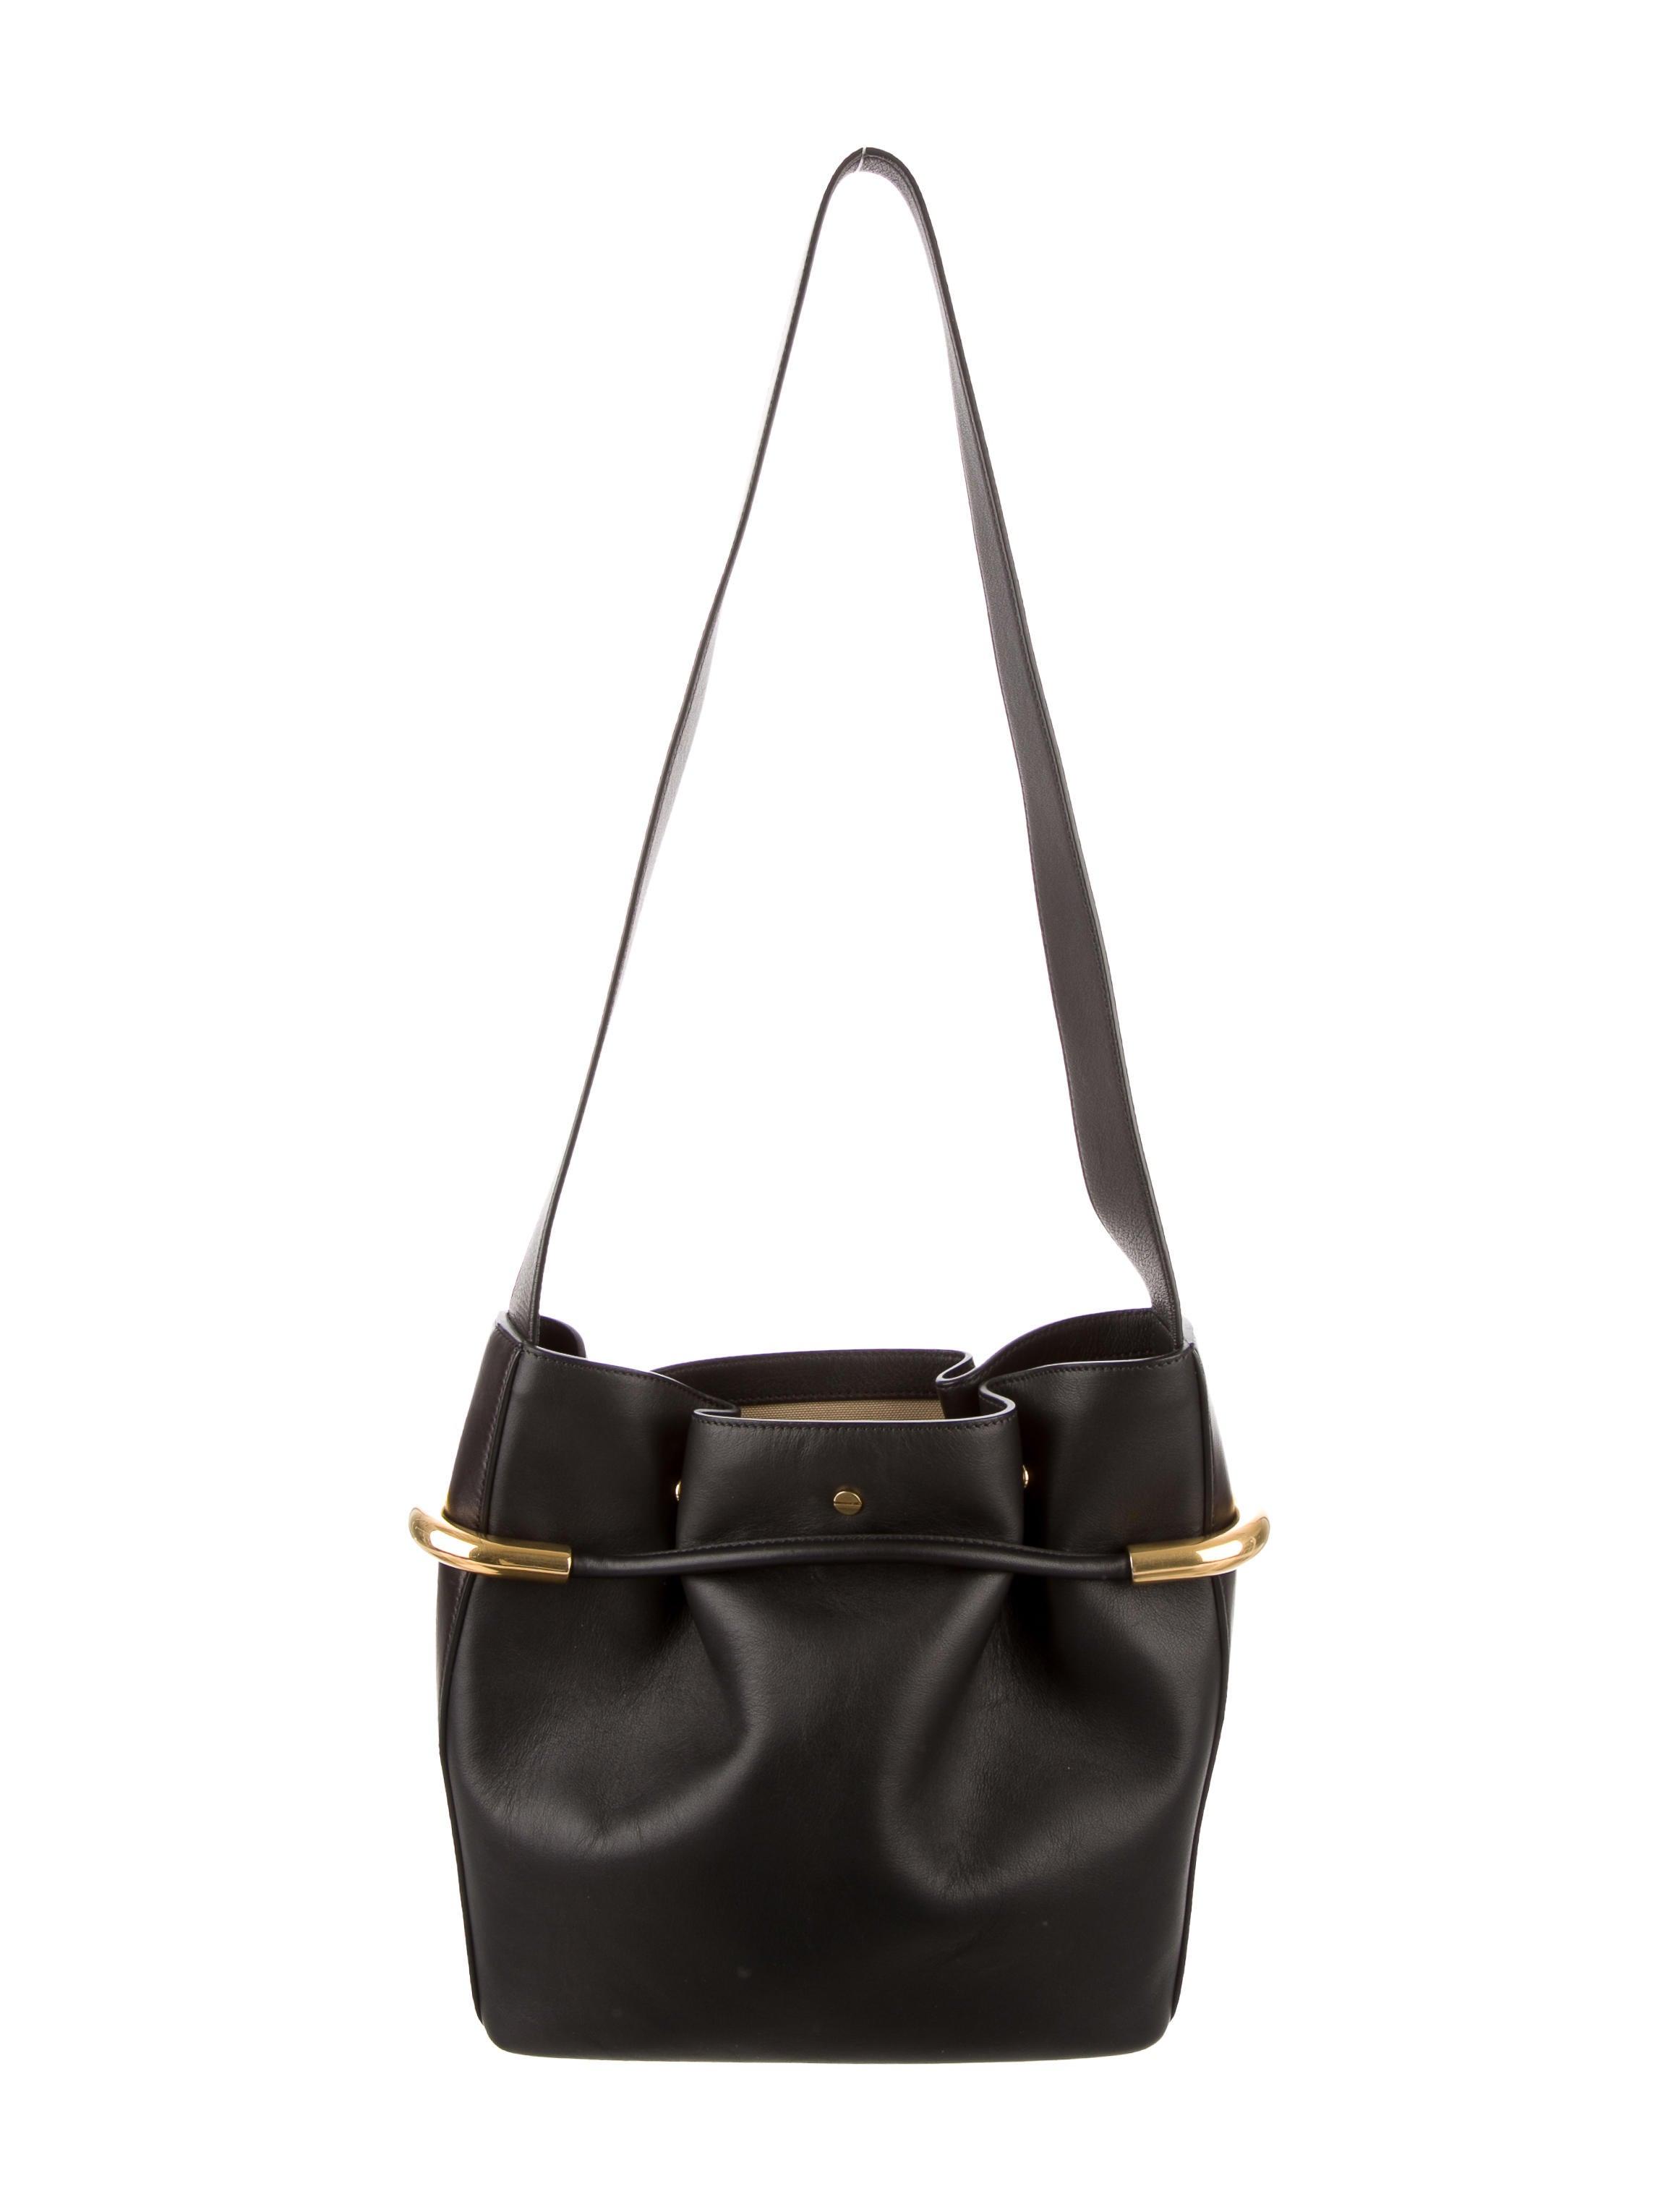 hermes wallet mens - chloe two-tone emma bag, cheap replica chloe handbags